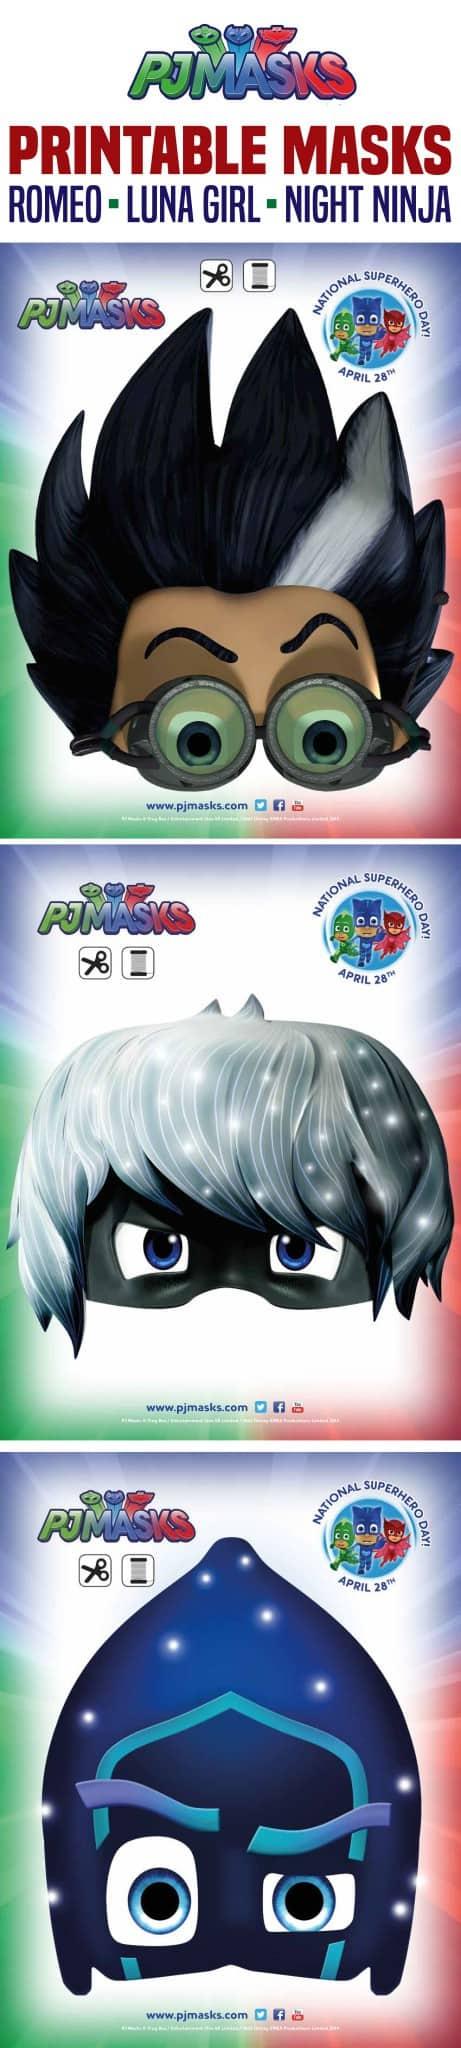 graphic regarding Printable Pj Masks identified as Printables - PJ Masks Night time Ninja, Romeo, Luna Everyday living She Is made up of